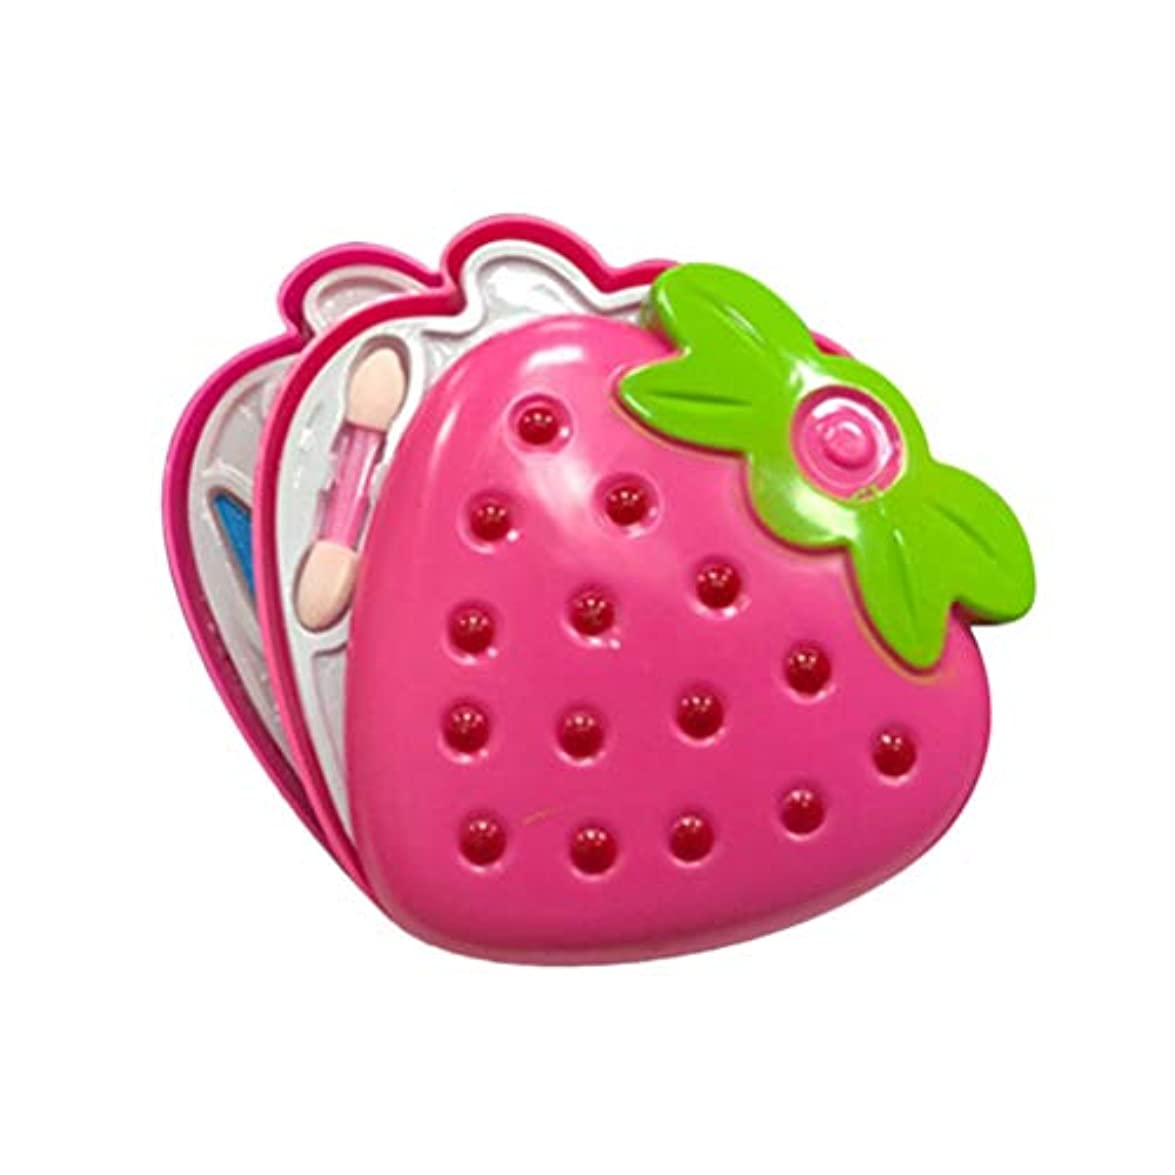 Toyvian キッズガールズメイクアップセット三層化粧品美容キット美容セット子供のためのミラー